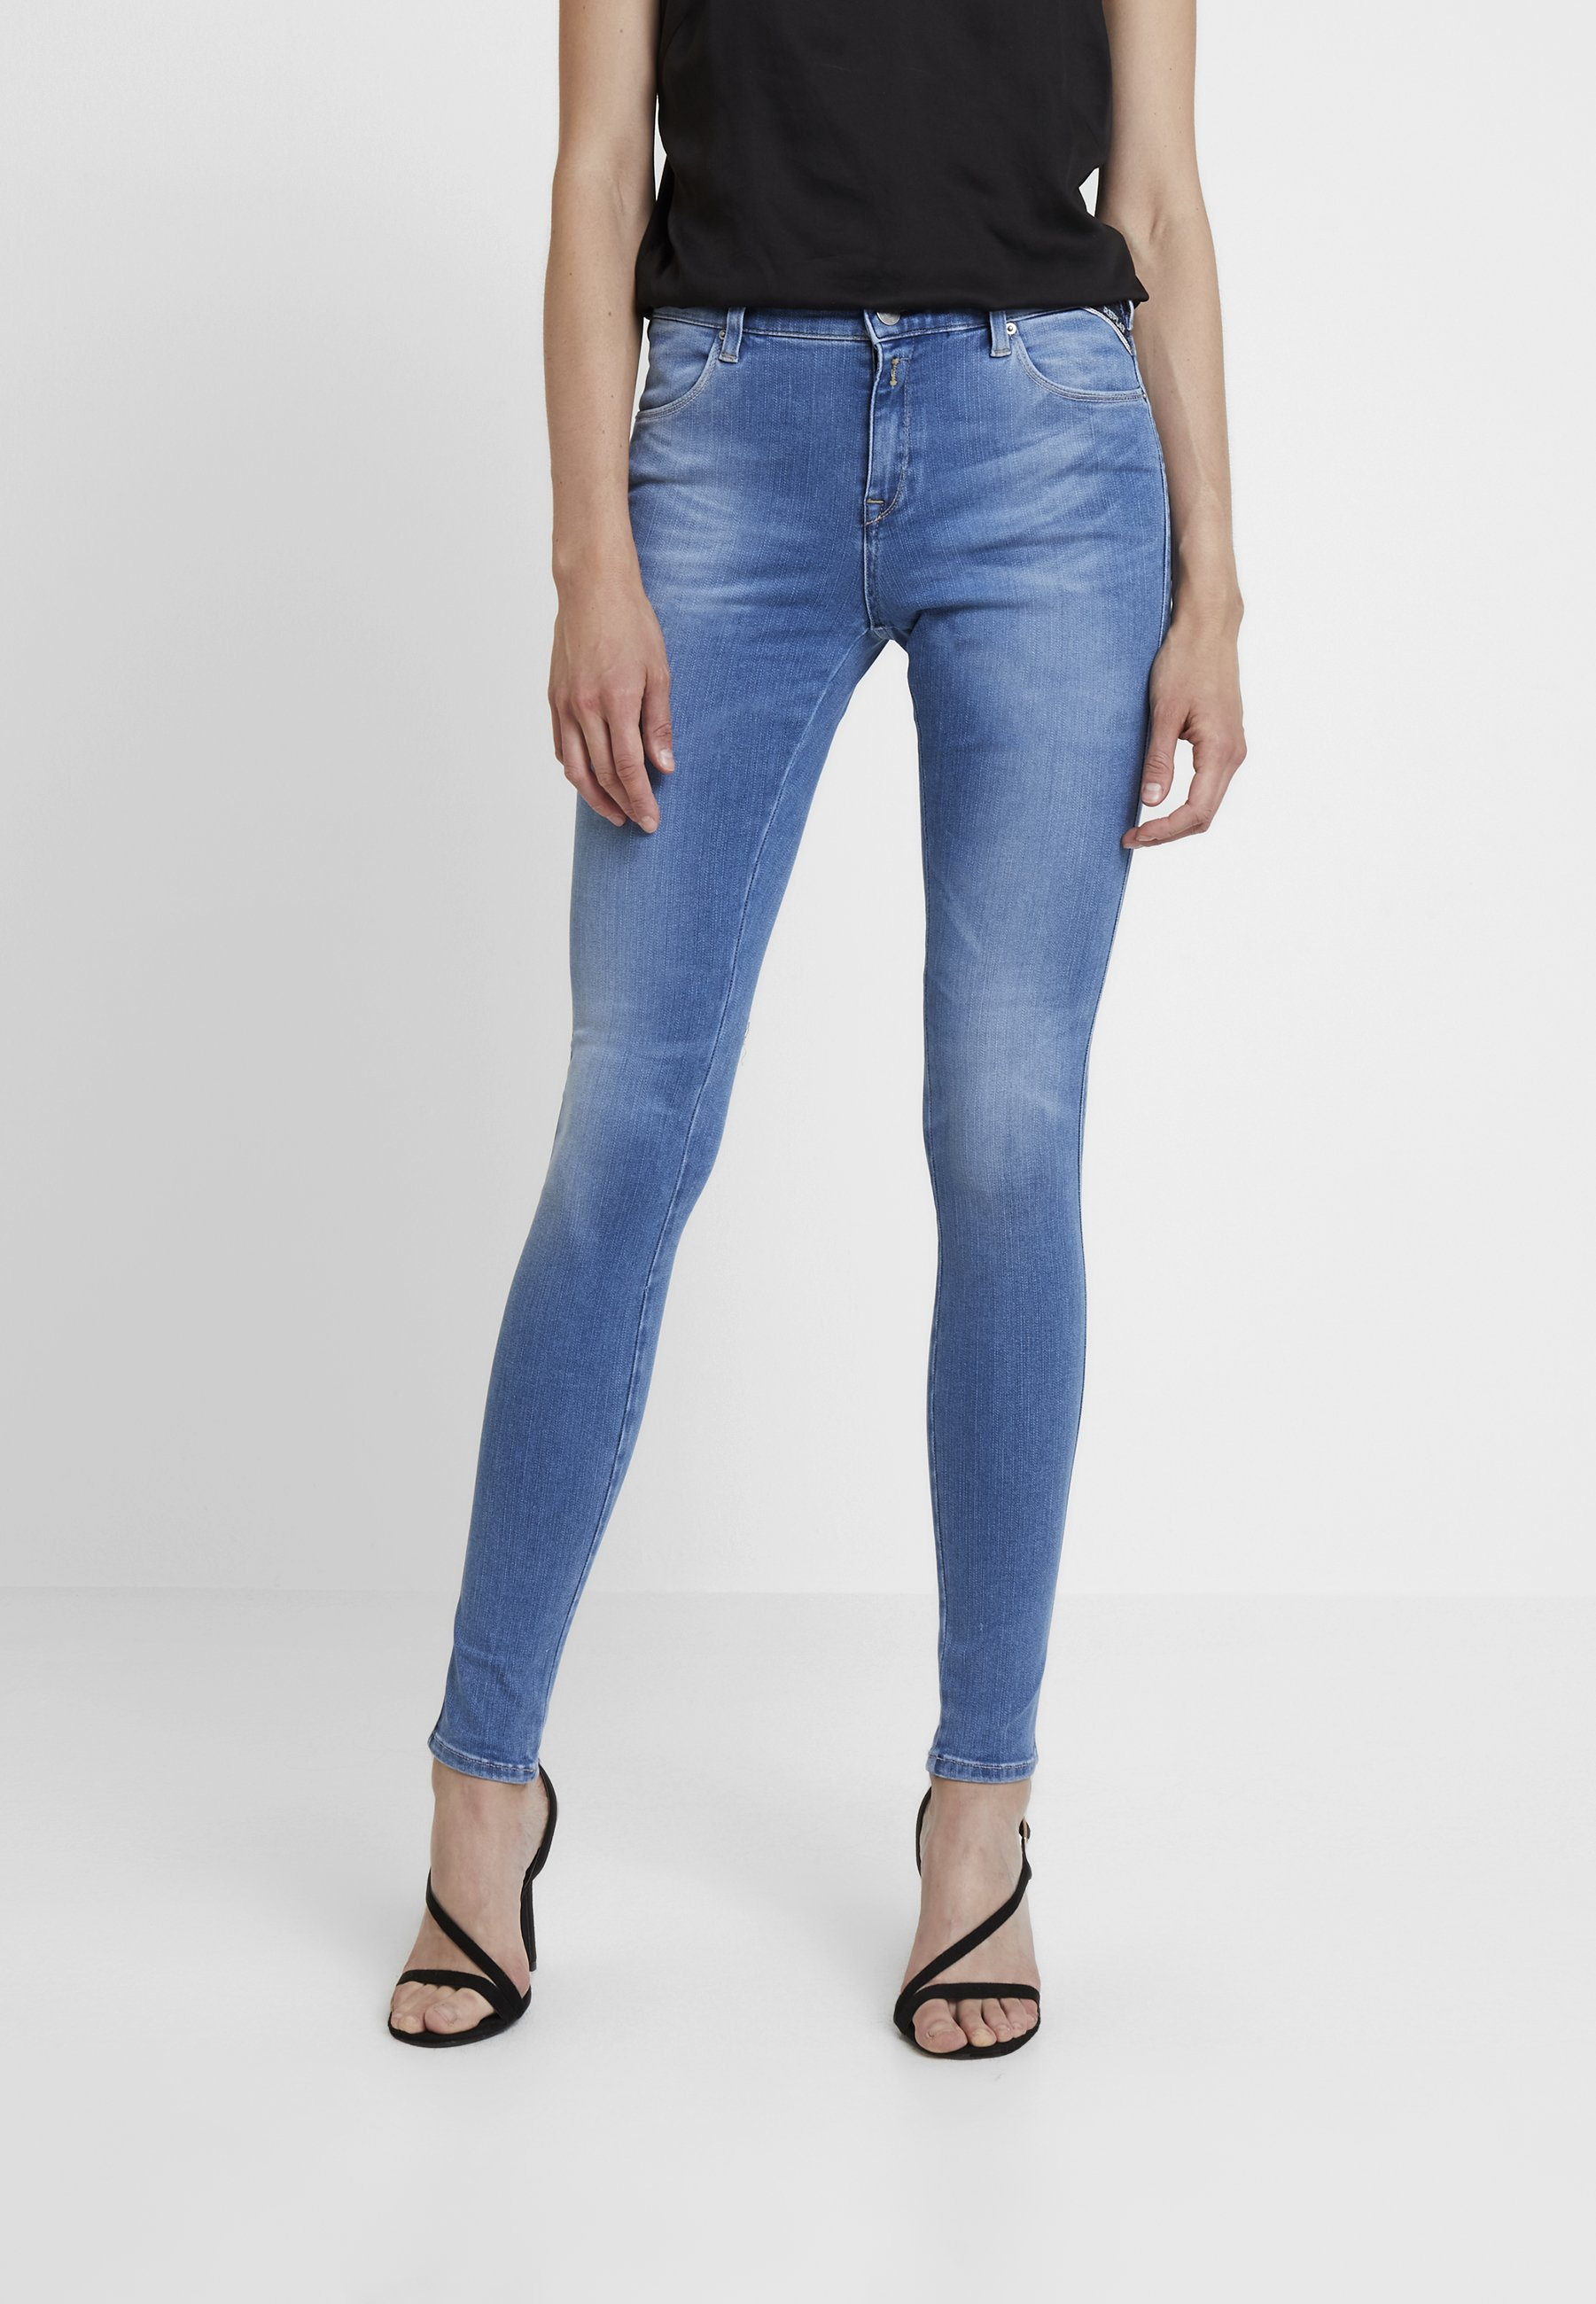 Replay Jeans Replay SkinnyLight Blue SkinnyLight Blue Jeans v8ymONwn0